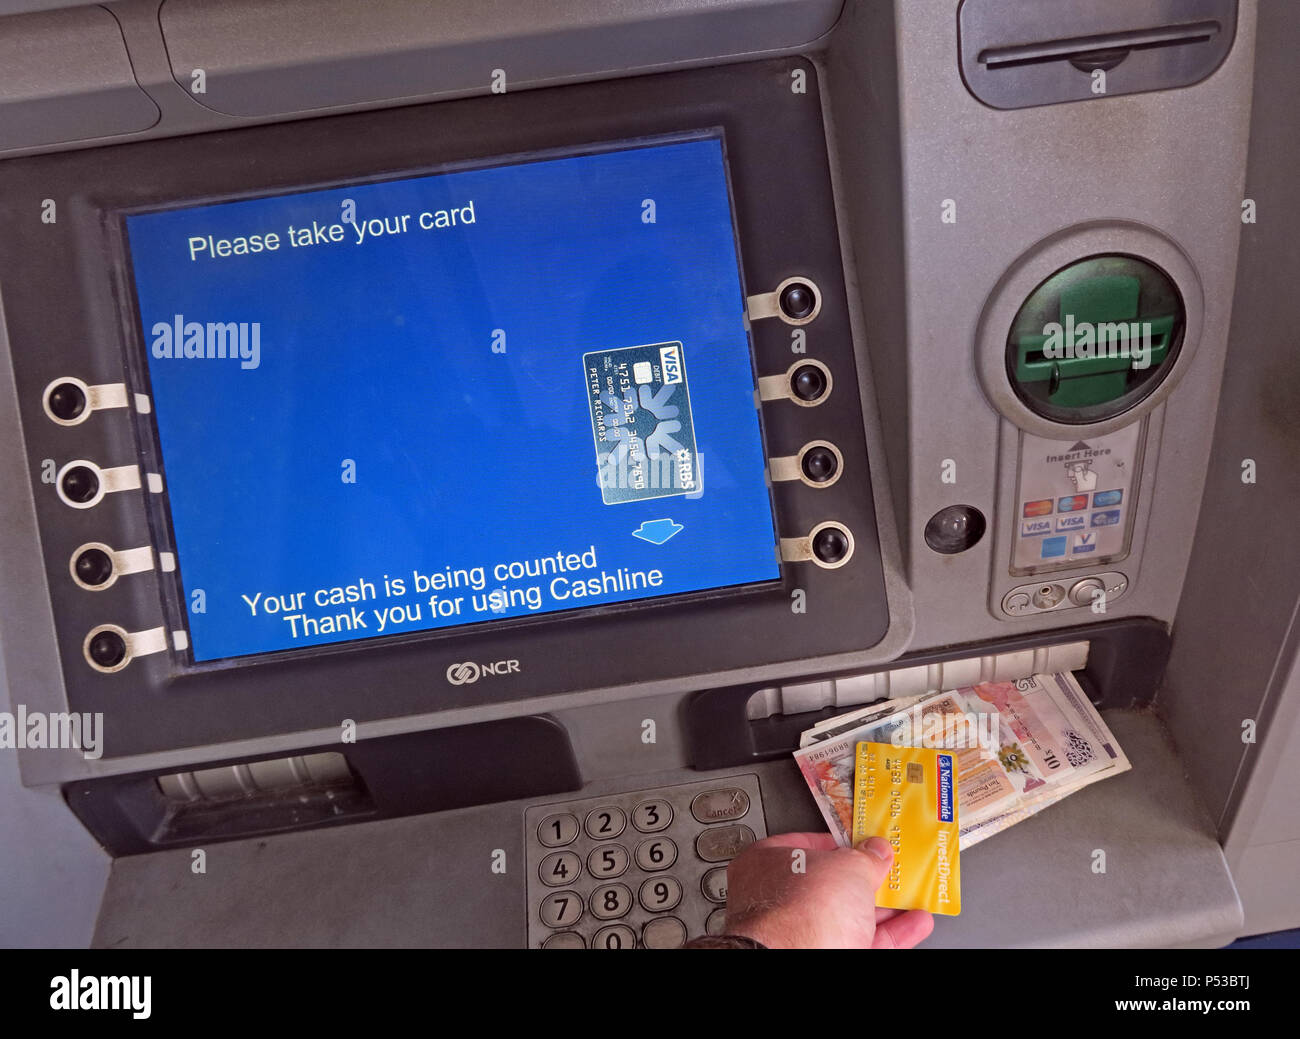 GoTonySmith,@HotpixUK,Cashline ATM Automatic Teller Machine,Glasgow,Scotland,UK,Cashline,ATM,Automatic Teller Machine,dispensing,Scottish,sterling,Scottish Sterling,banknotes,cash machine,free to use,dispensing cash